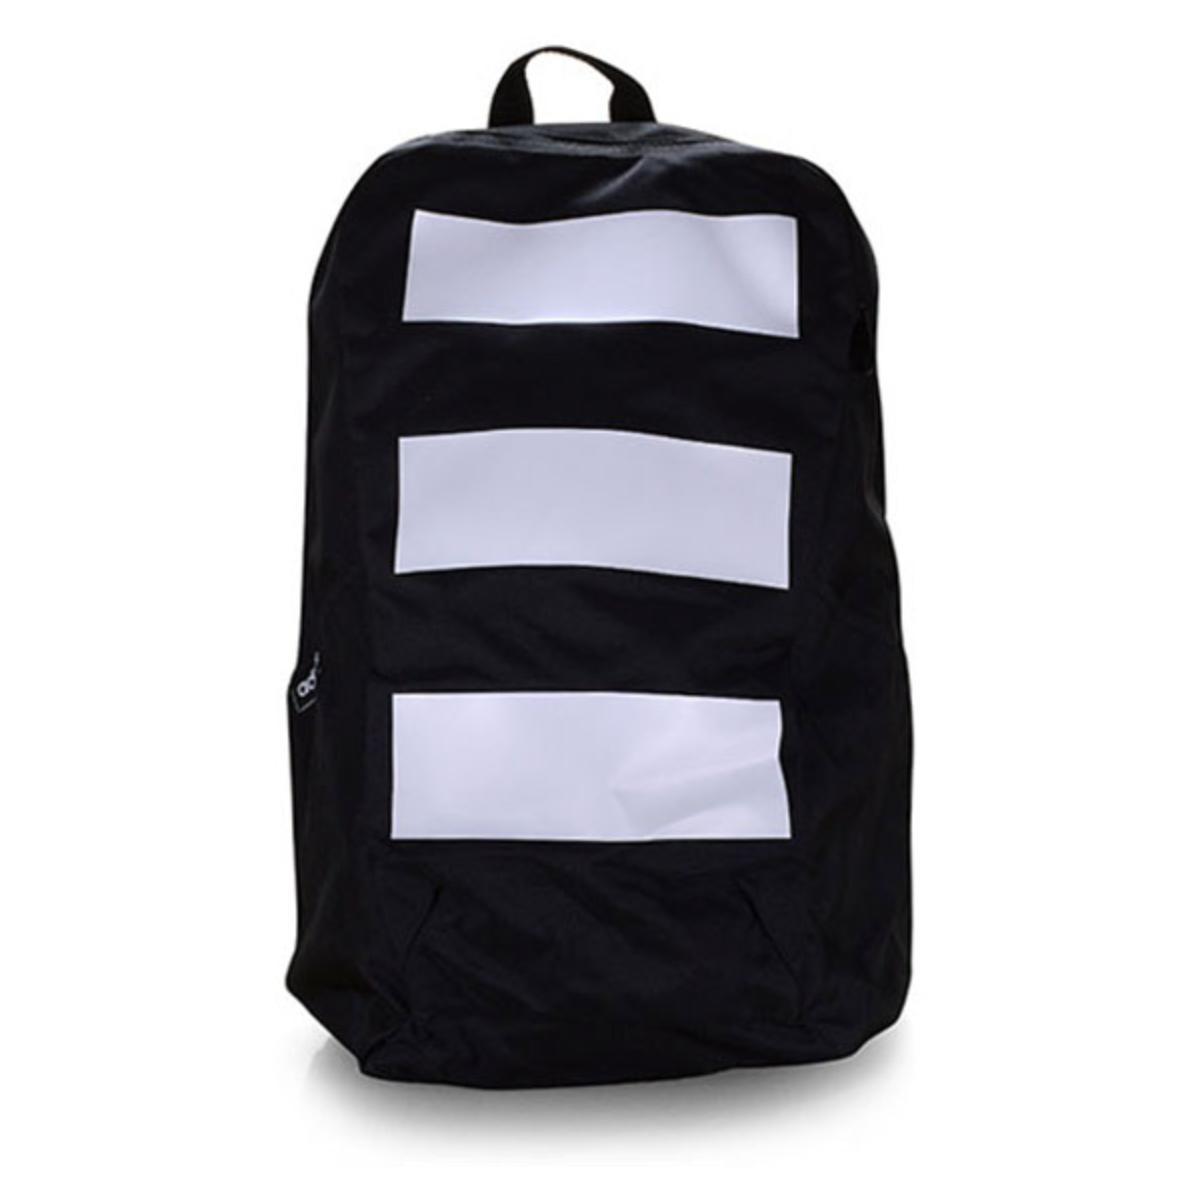 Mochila Masc Infantil Adidas Ed0260 Parkhood 3s bp Preto/branco